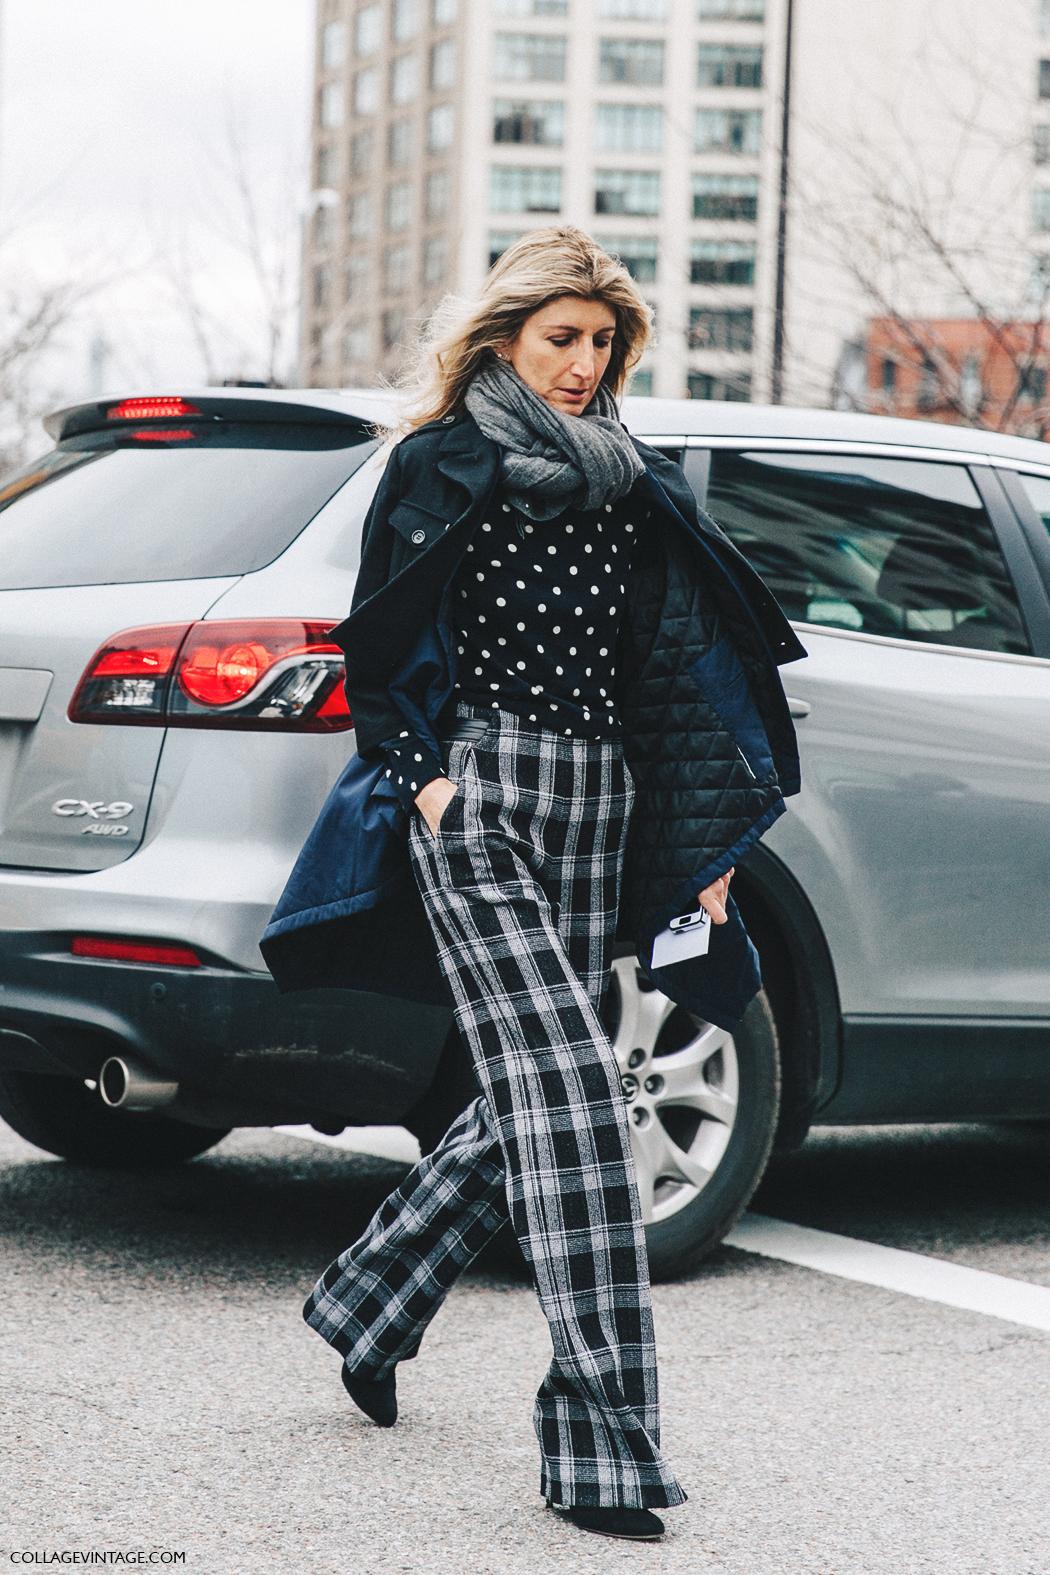 NYFW-New_York_Fashion_Week-Fall_Winter-17-Street_Style-Sarah_Ruston-5